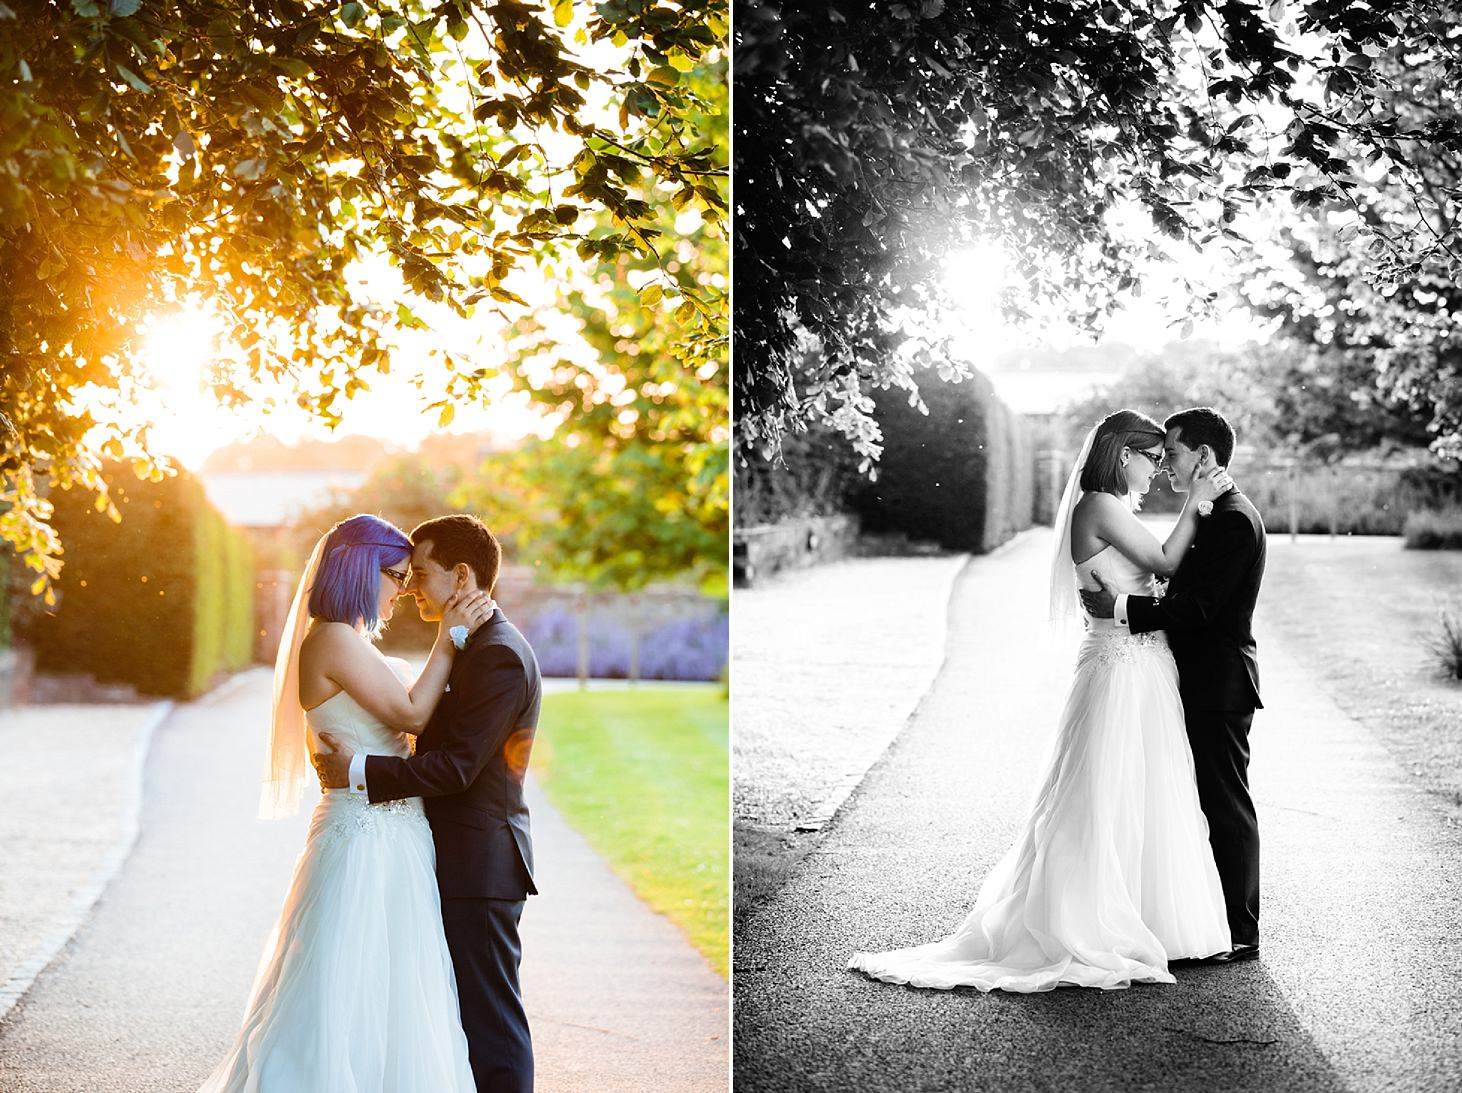 gate street barn wedding photography golden hour portrait